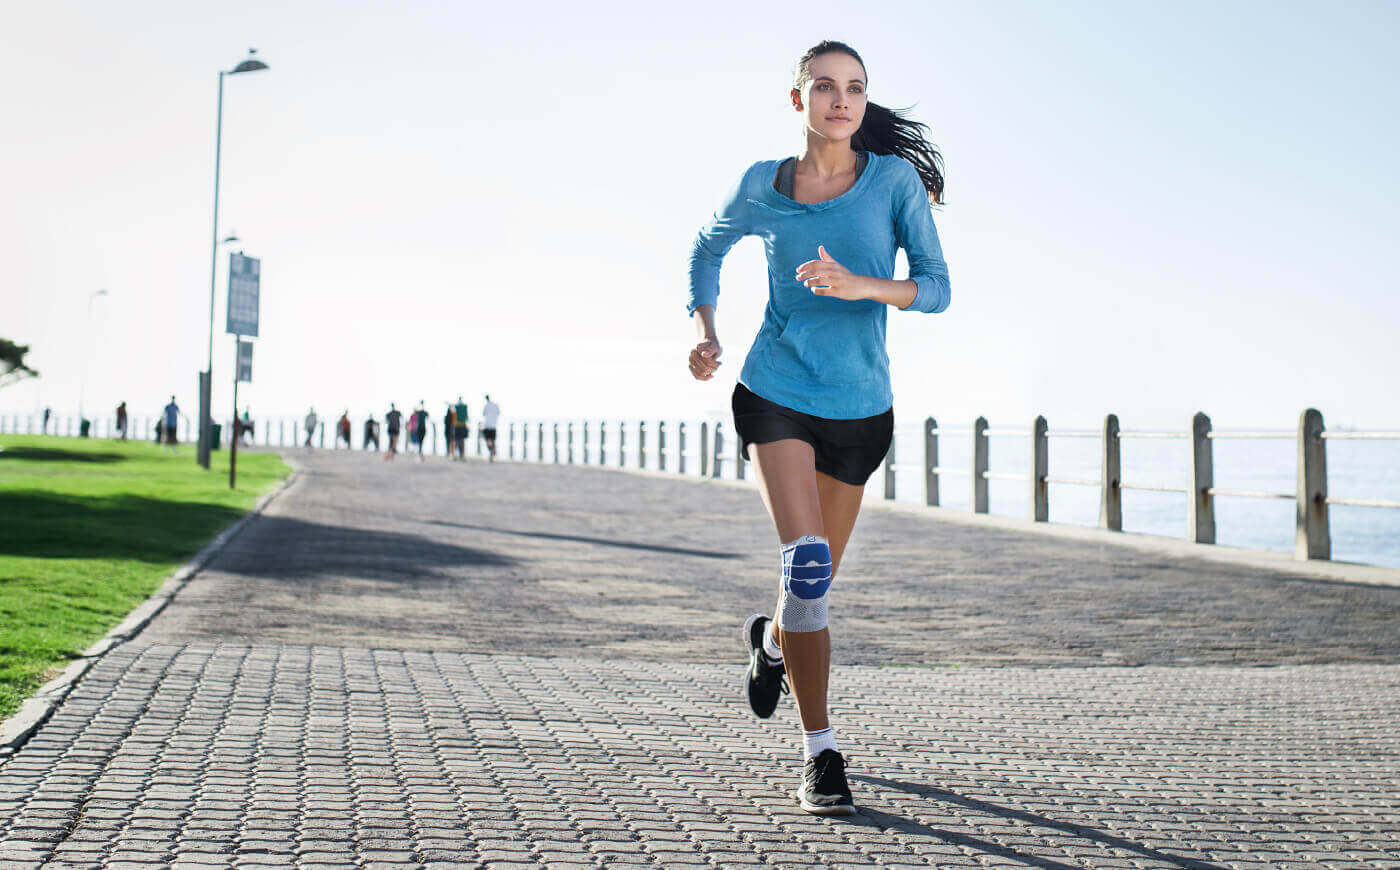 cyclos bauerfeind bandage stuetzstrumpf sport